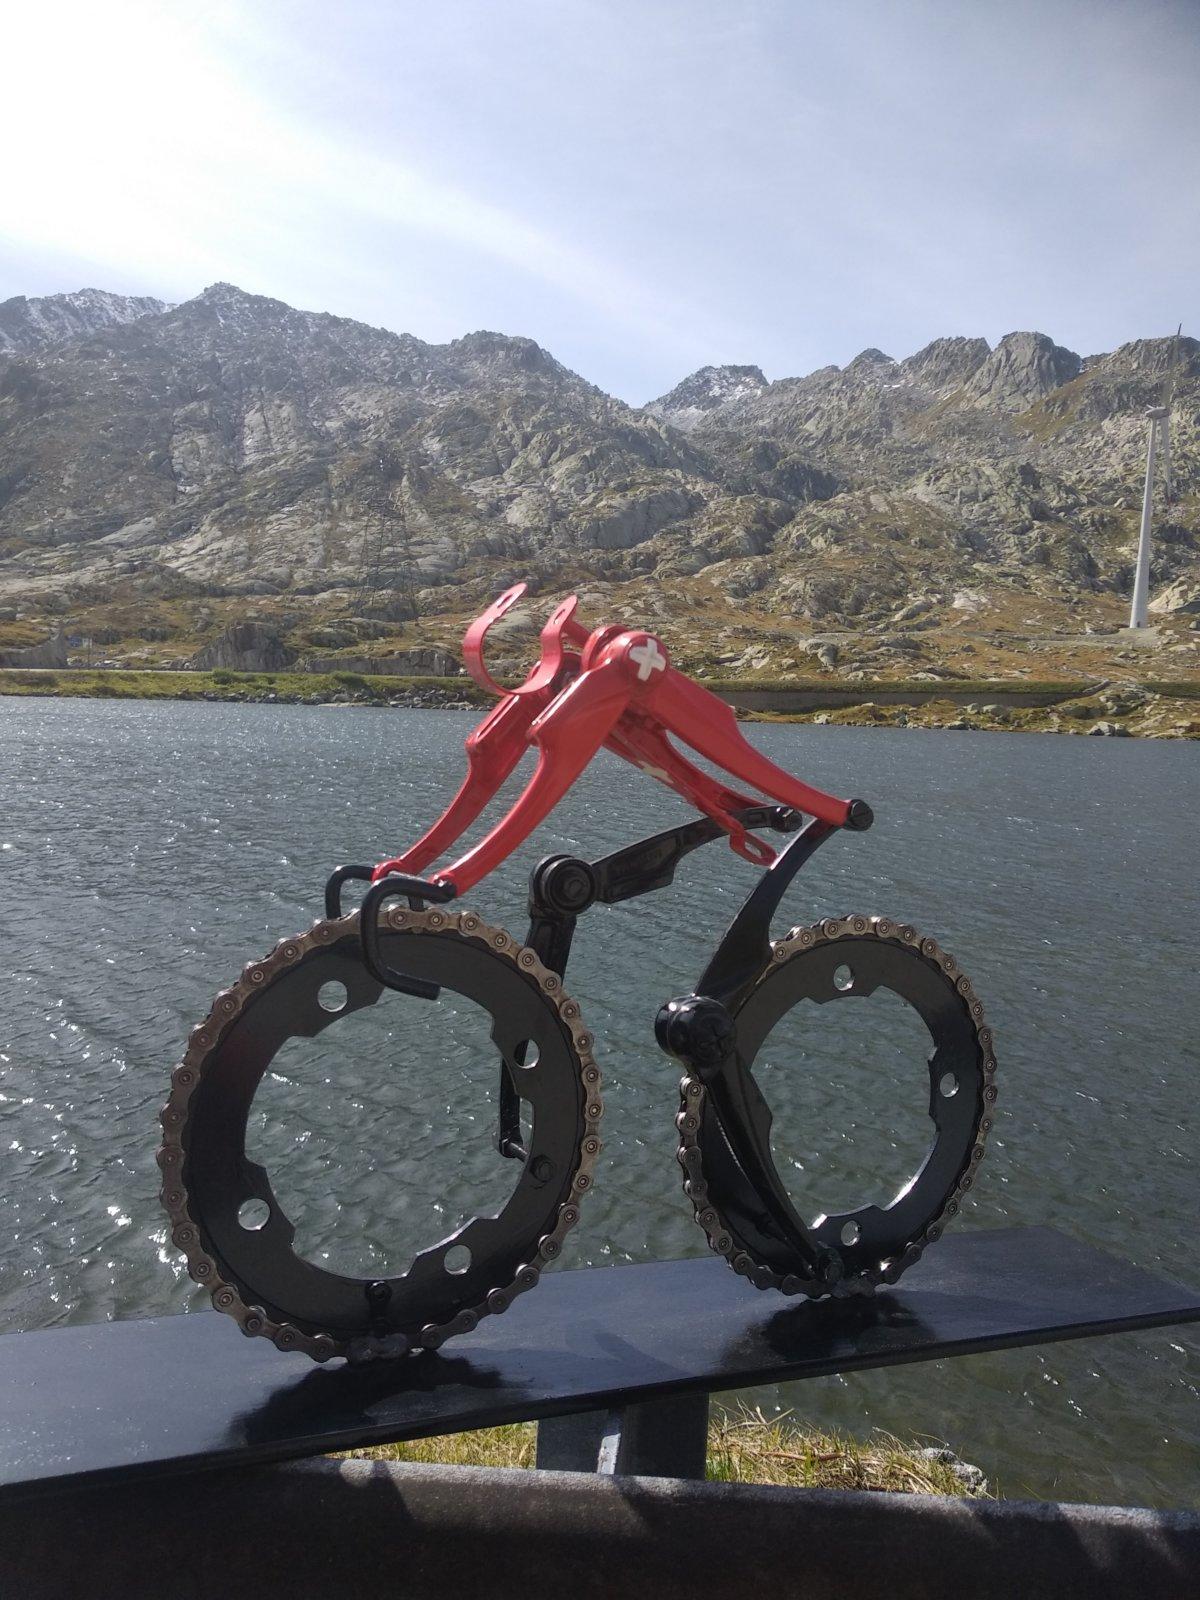 Swiss Champion Cyclist Cycling Art Decreatievelink NL